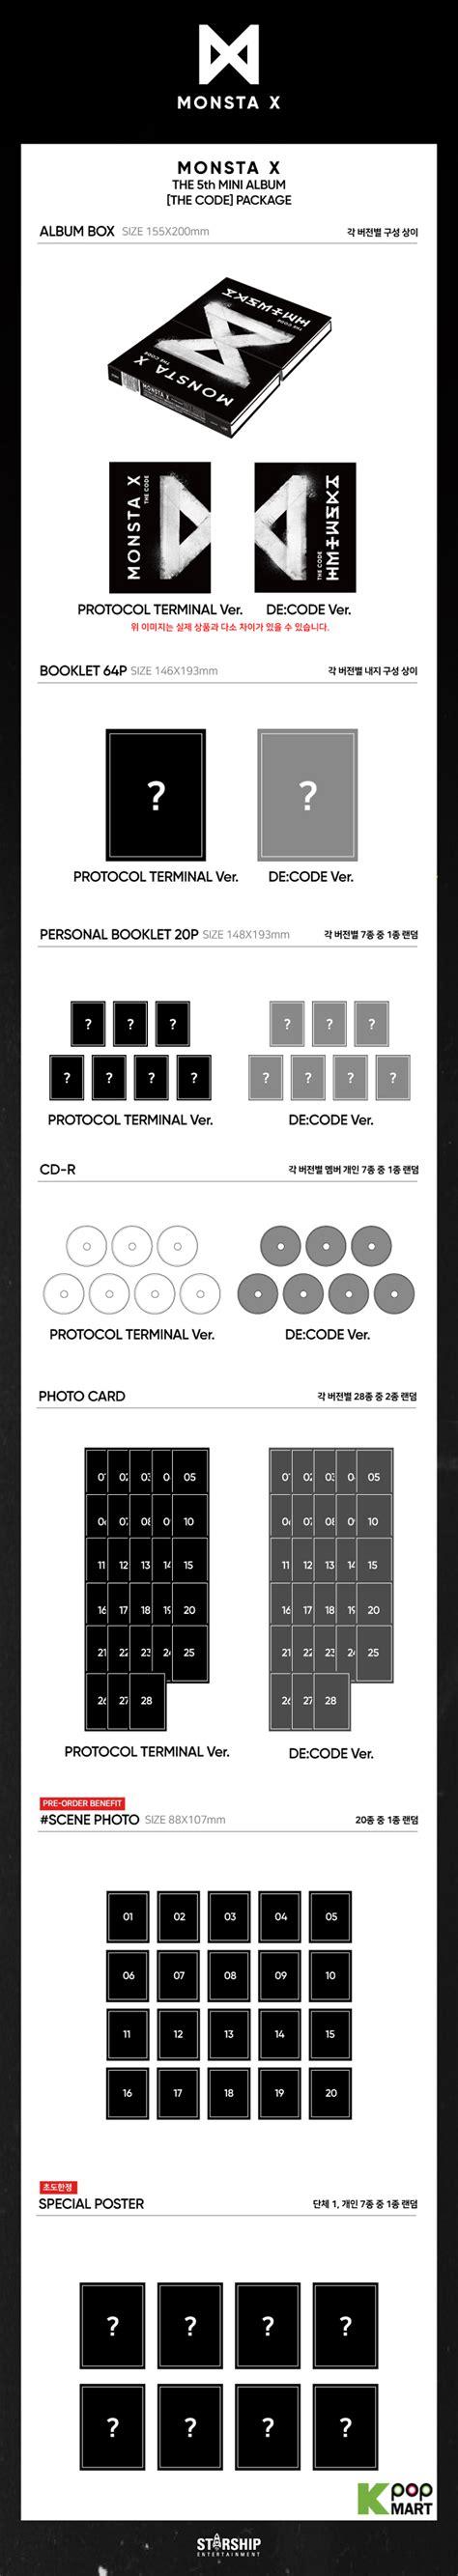 monsta x album list in order monsta x mini album vol 5 the code random